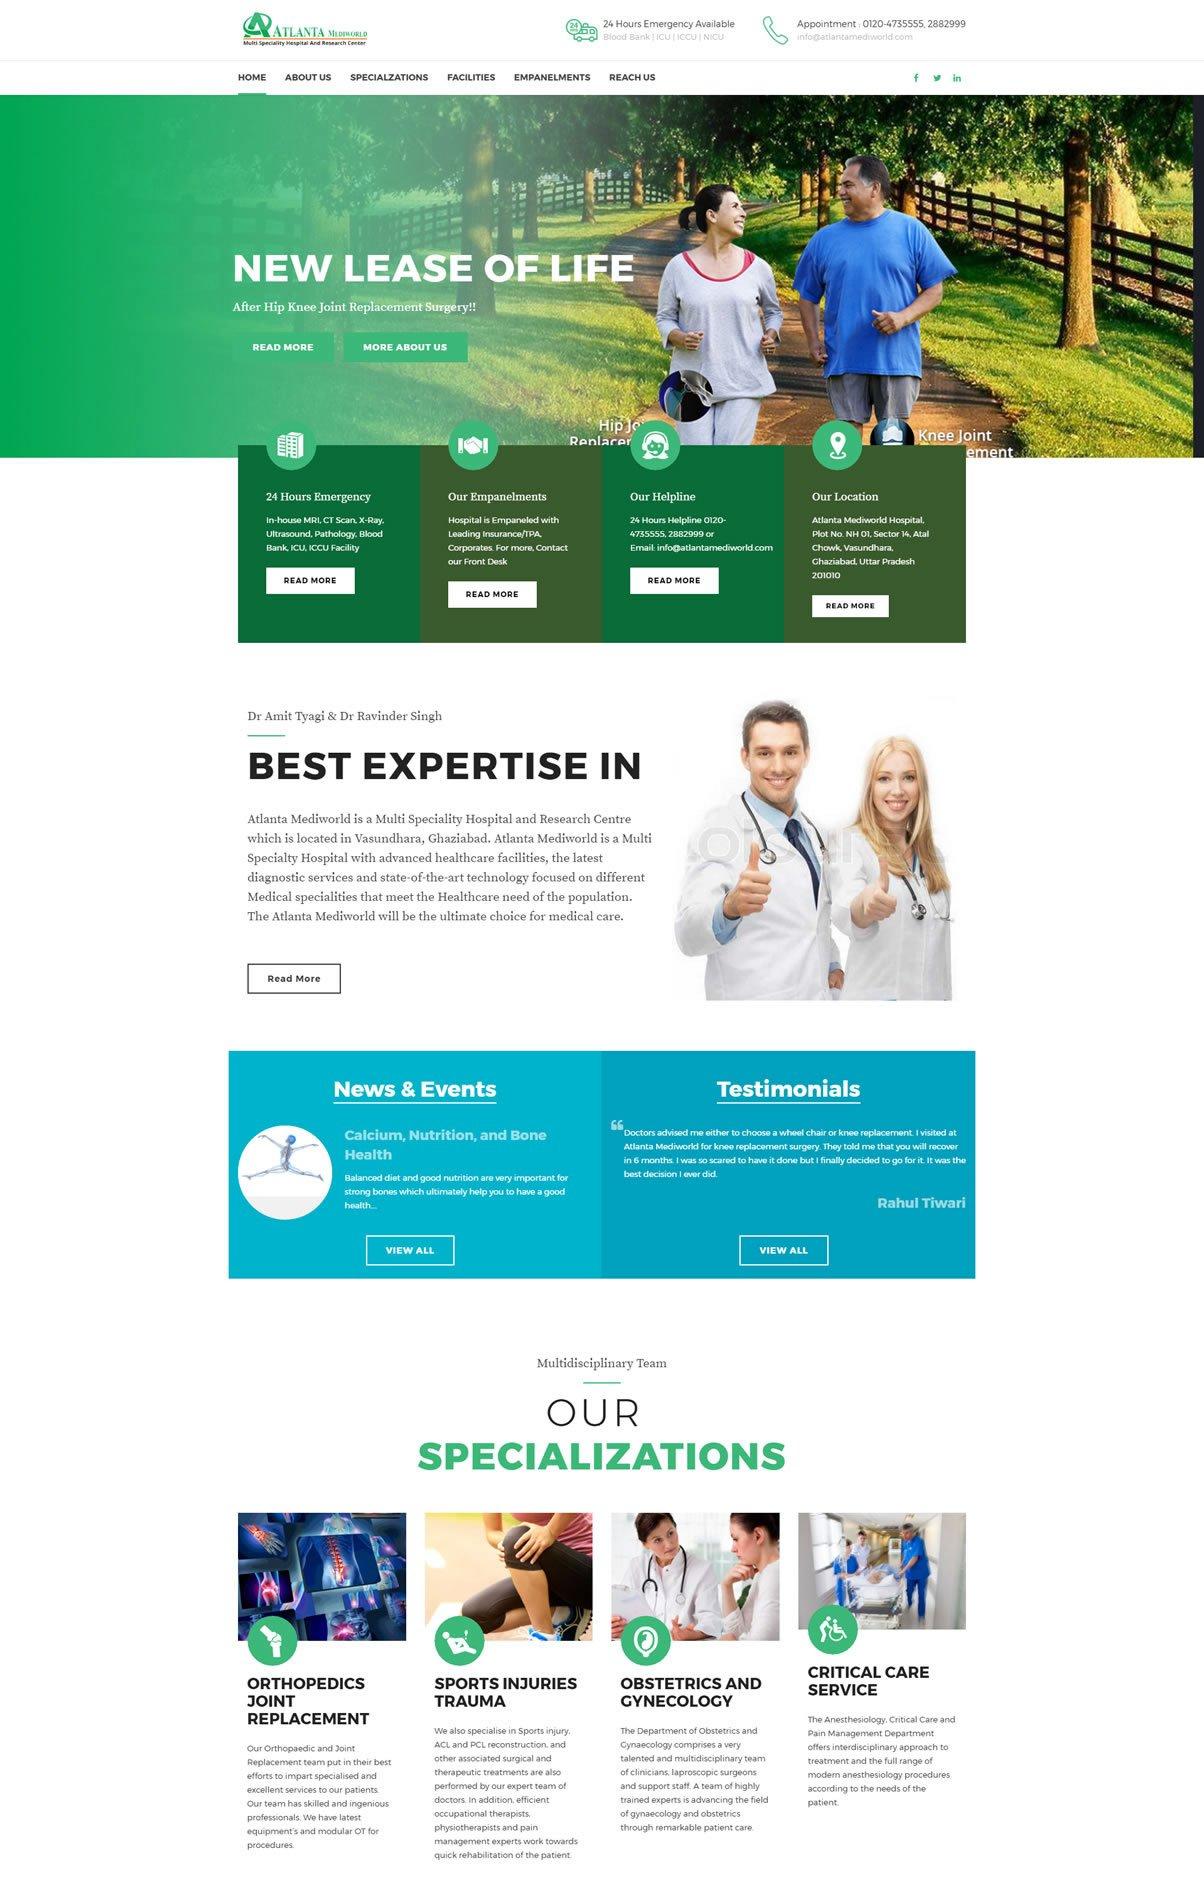 Hospital-website-designing-company-1